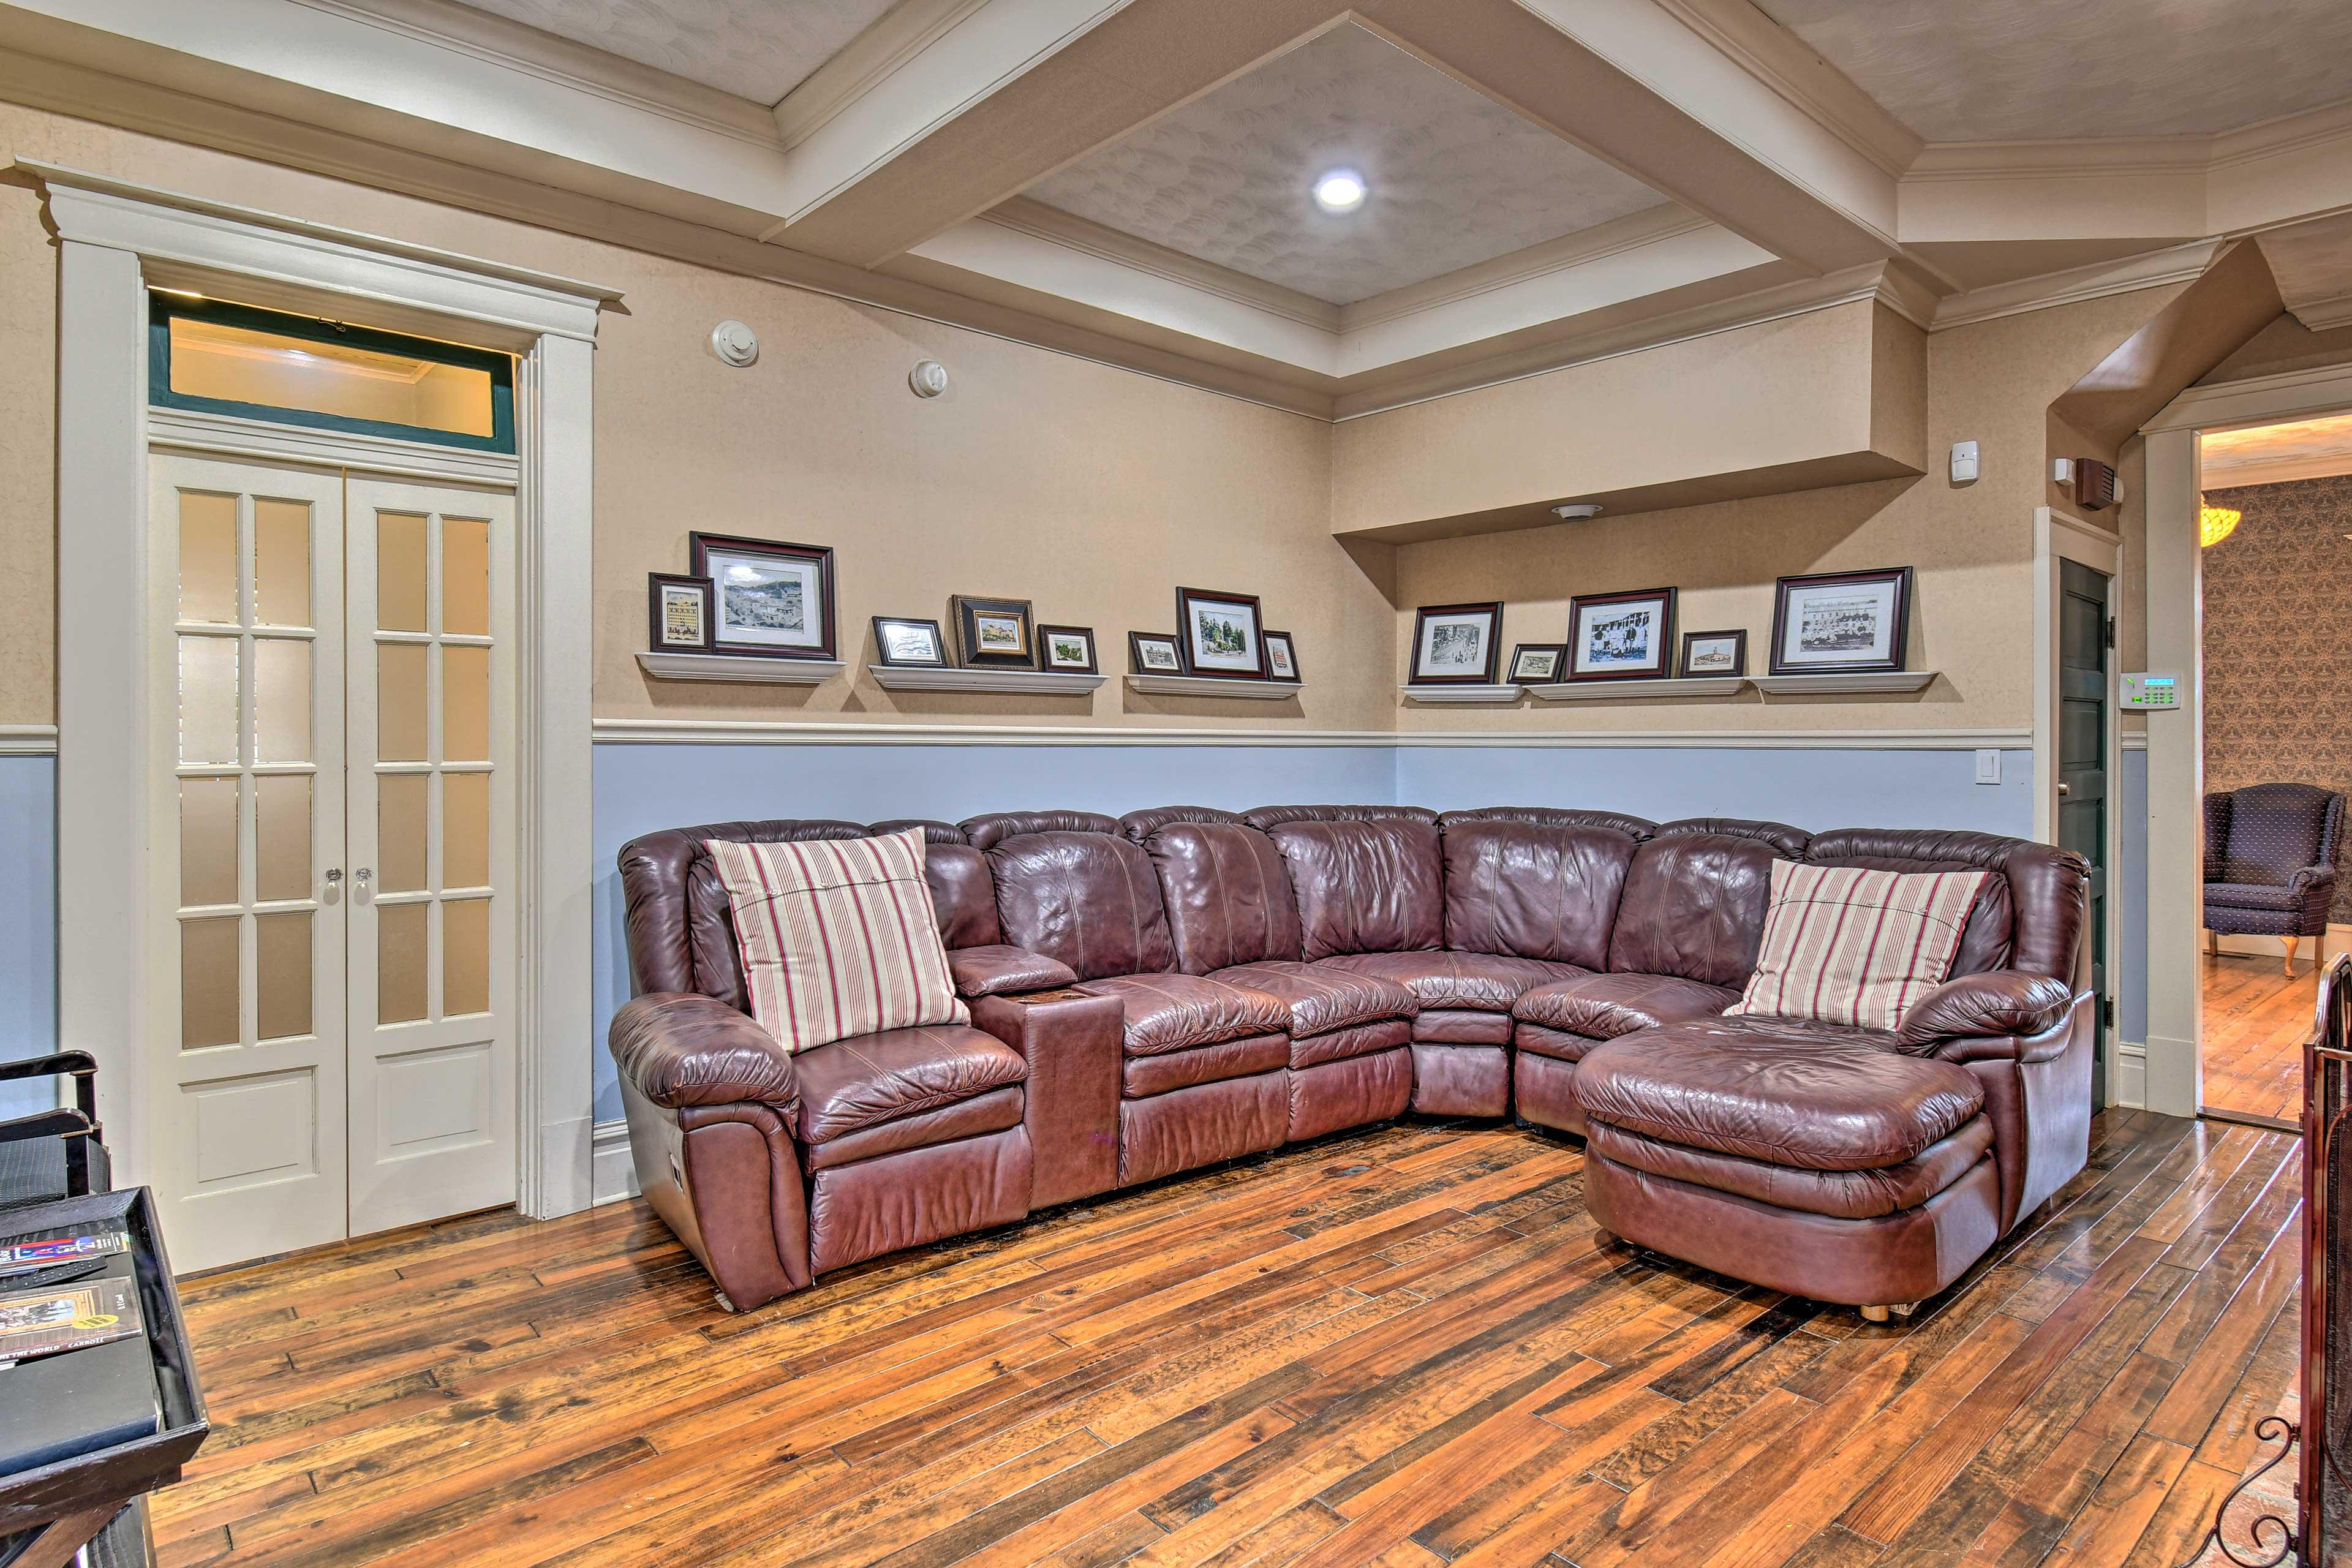 Original hardwood floors are found throughout.